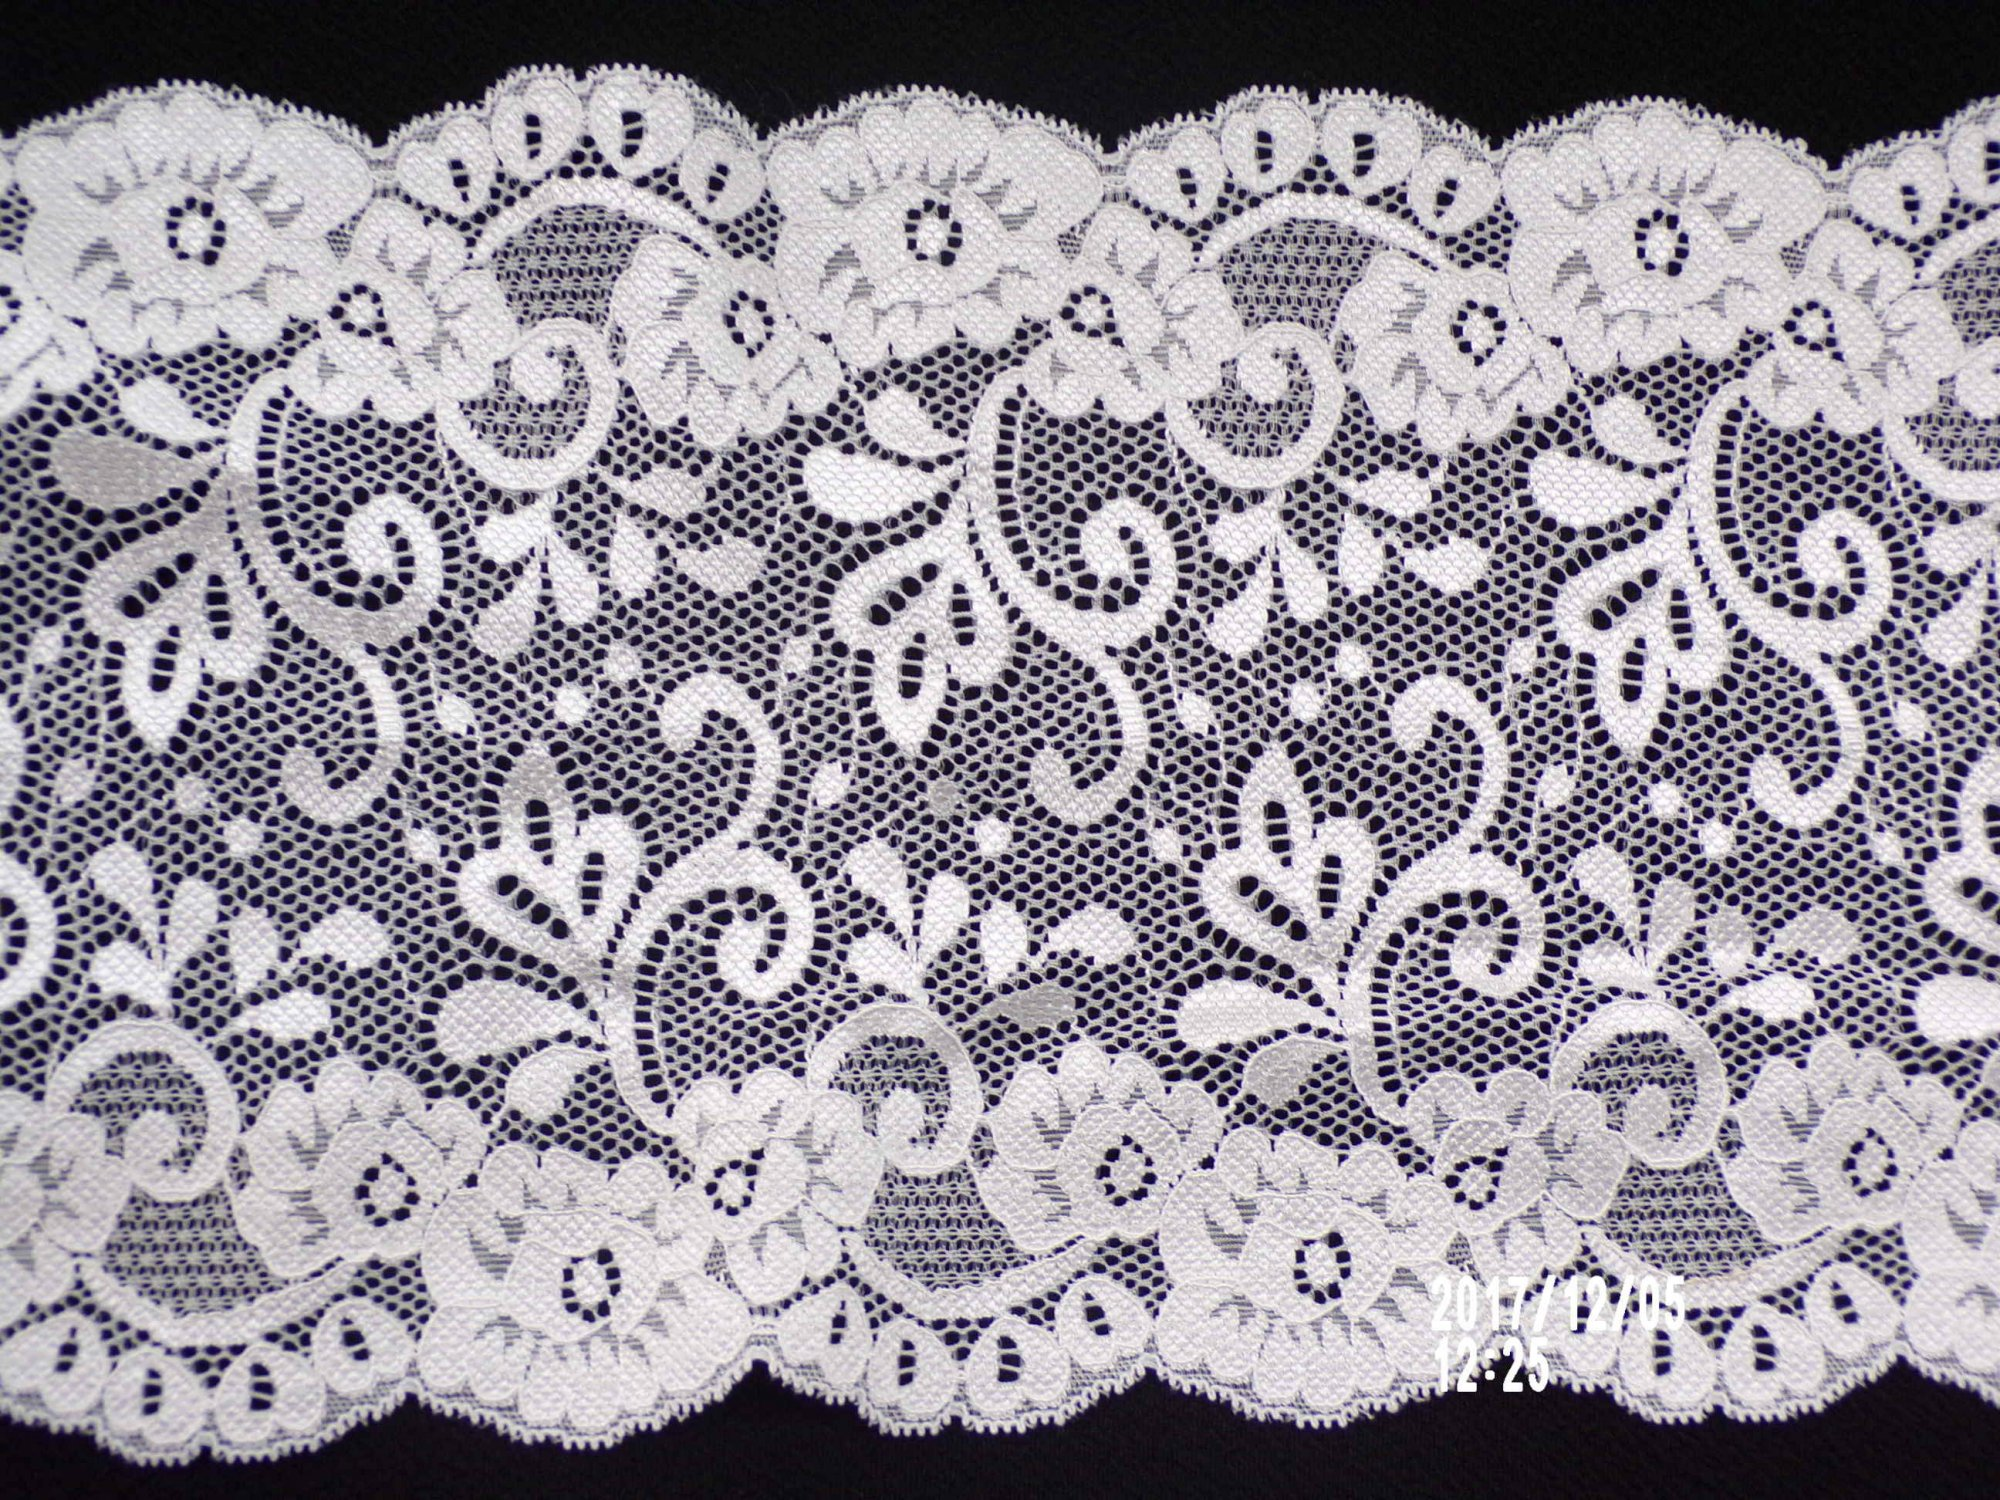 7in Raw White stretch lace (SL364)